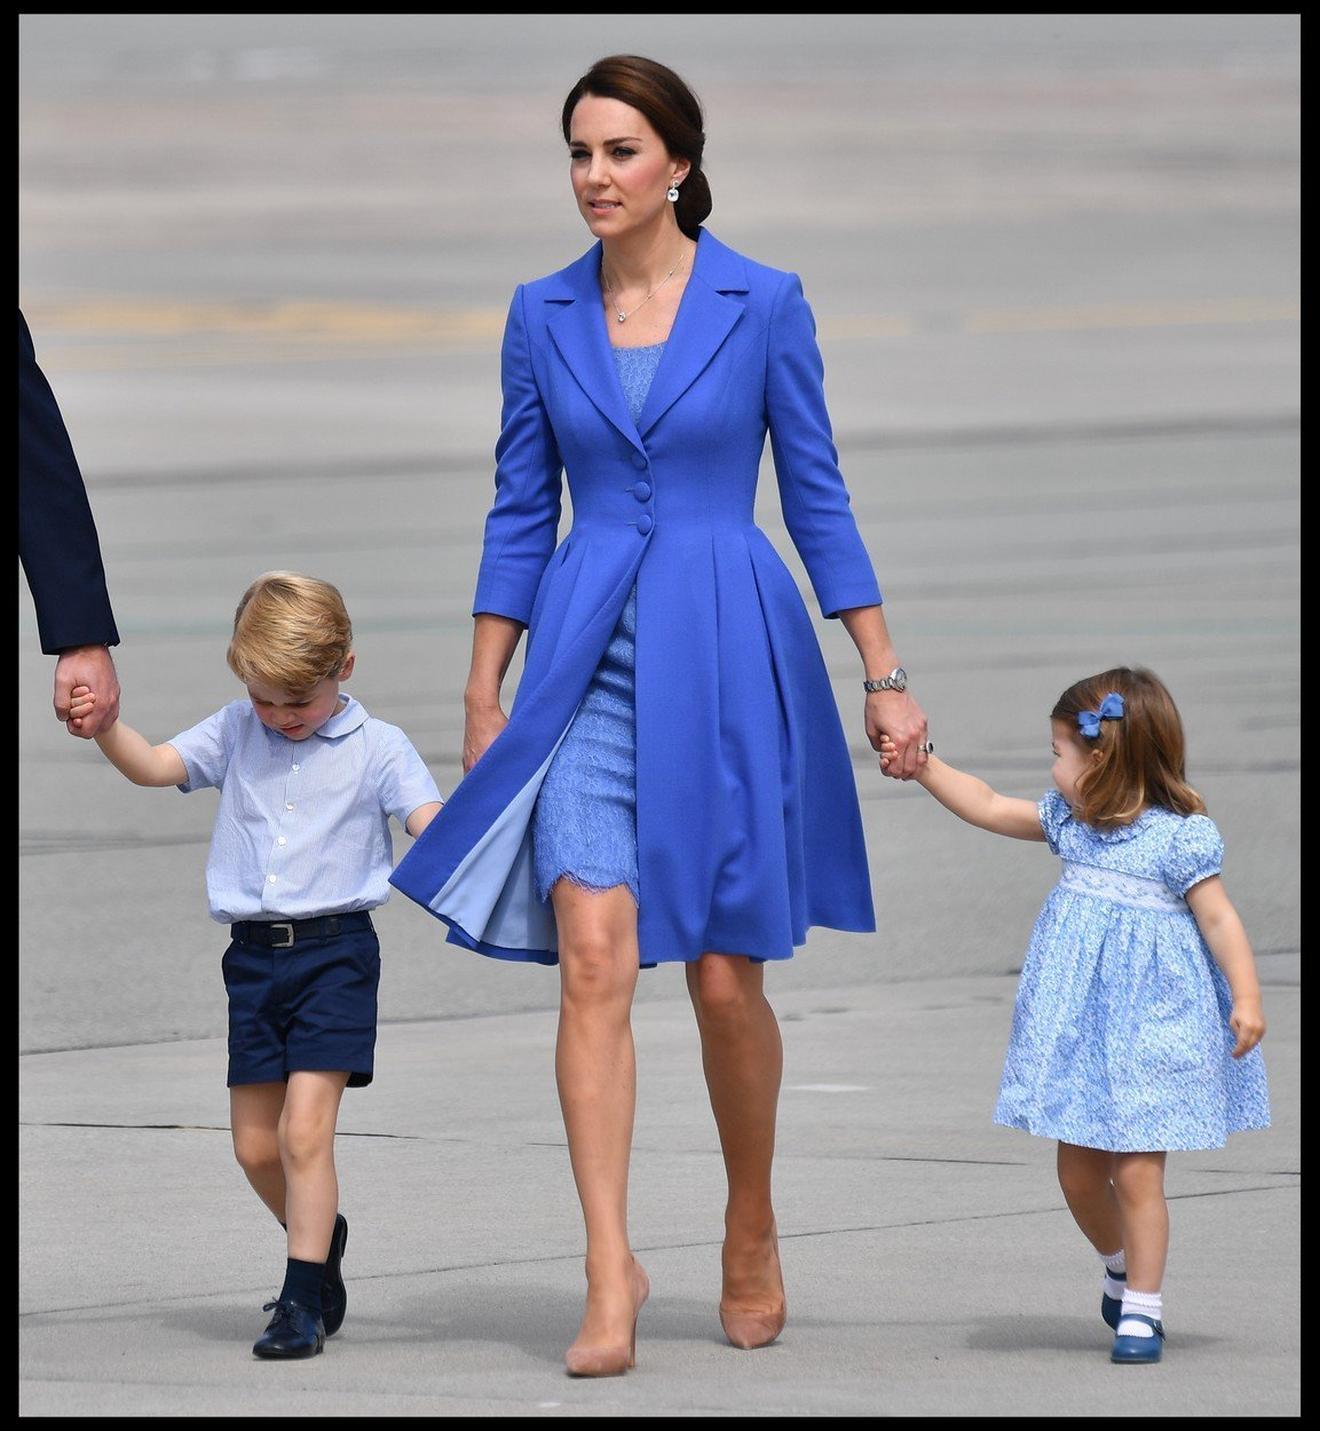 Vojvotkinja od Kembdriža sa decom, princom Džorždem i ćerkom princezom Šarlot Elizabet Dajanom: njen ogroman modni uticaj i nepobediv imidž vojvotkinje iz naroda